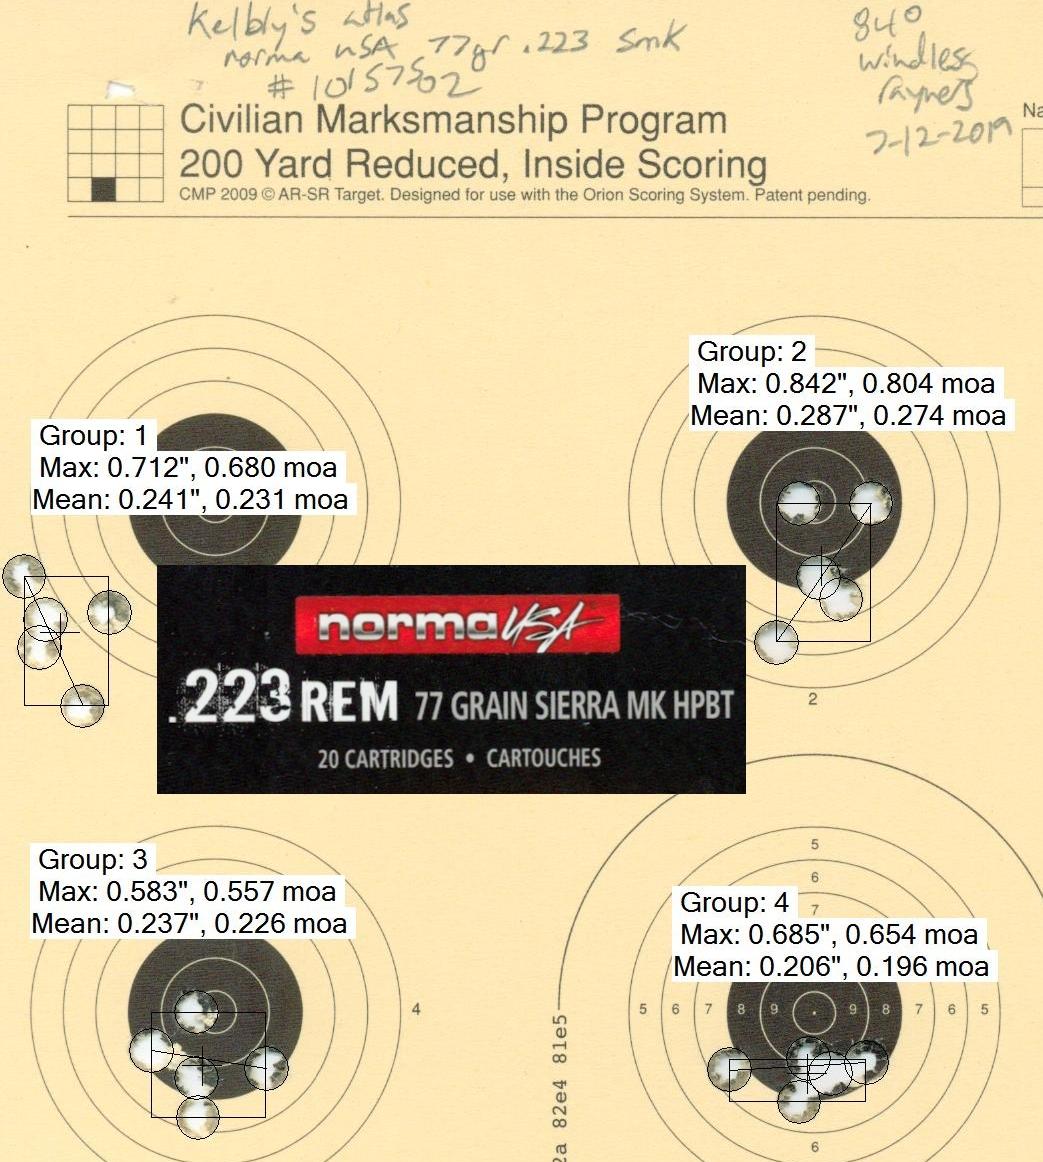 Norma USA 77gr SMK testing w/ Kelbly's Atlas Tactical